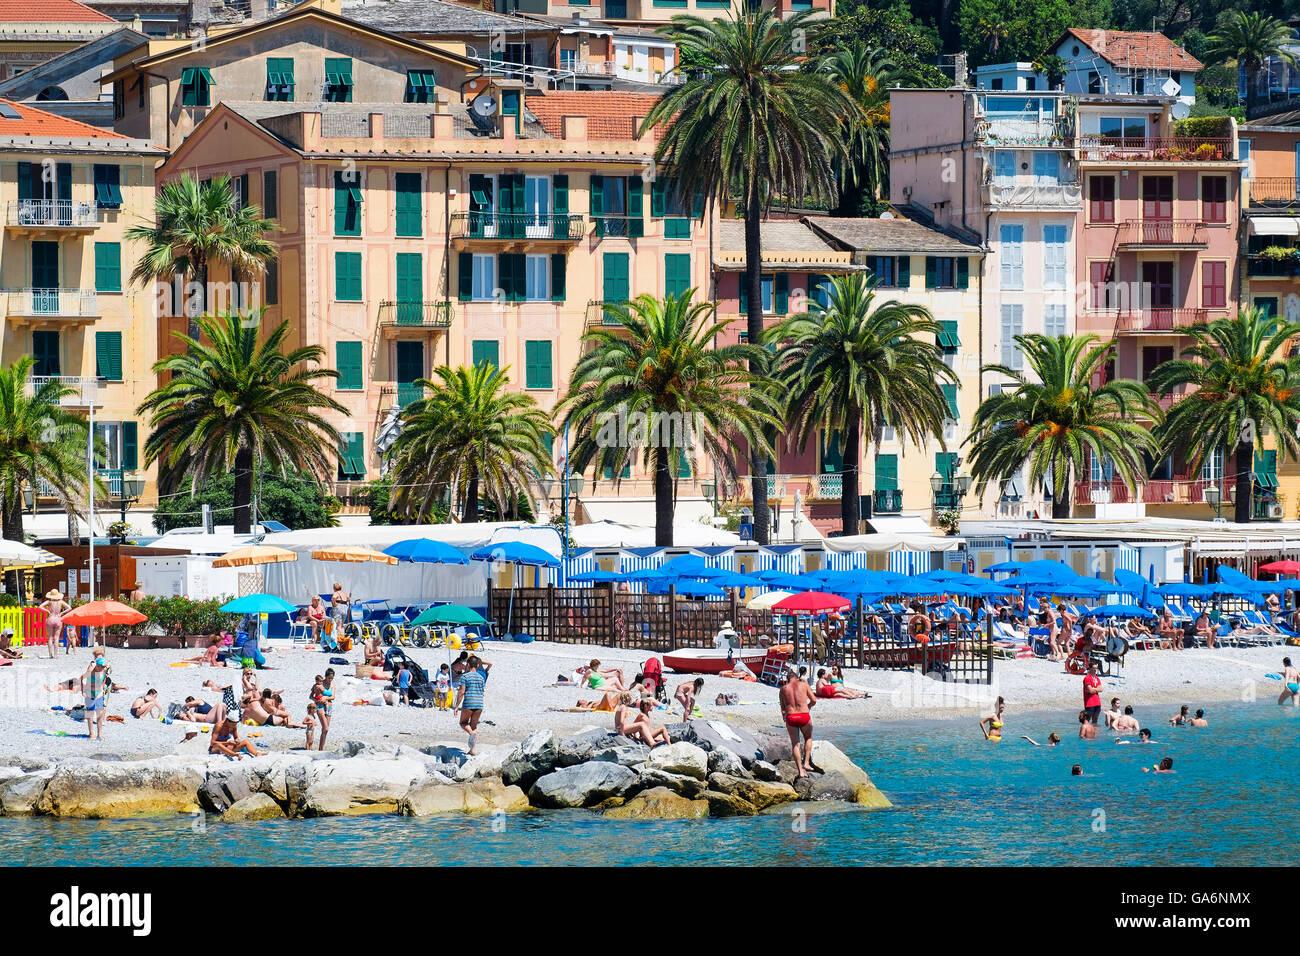 Hotels In Santa Margherita Ligure